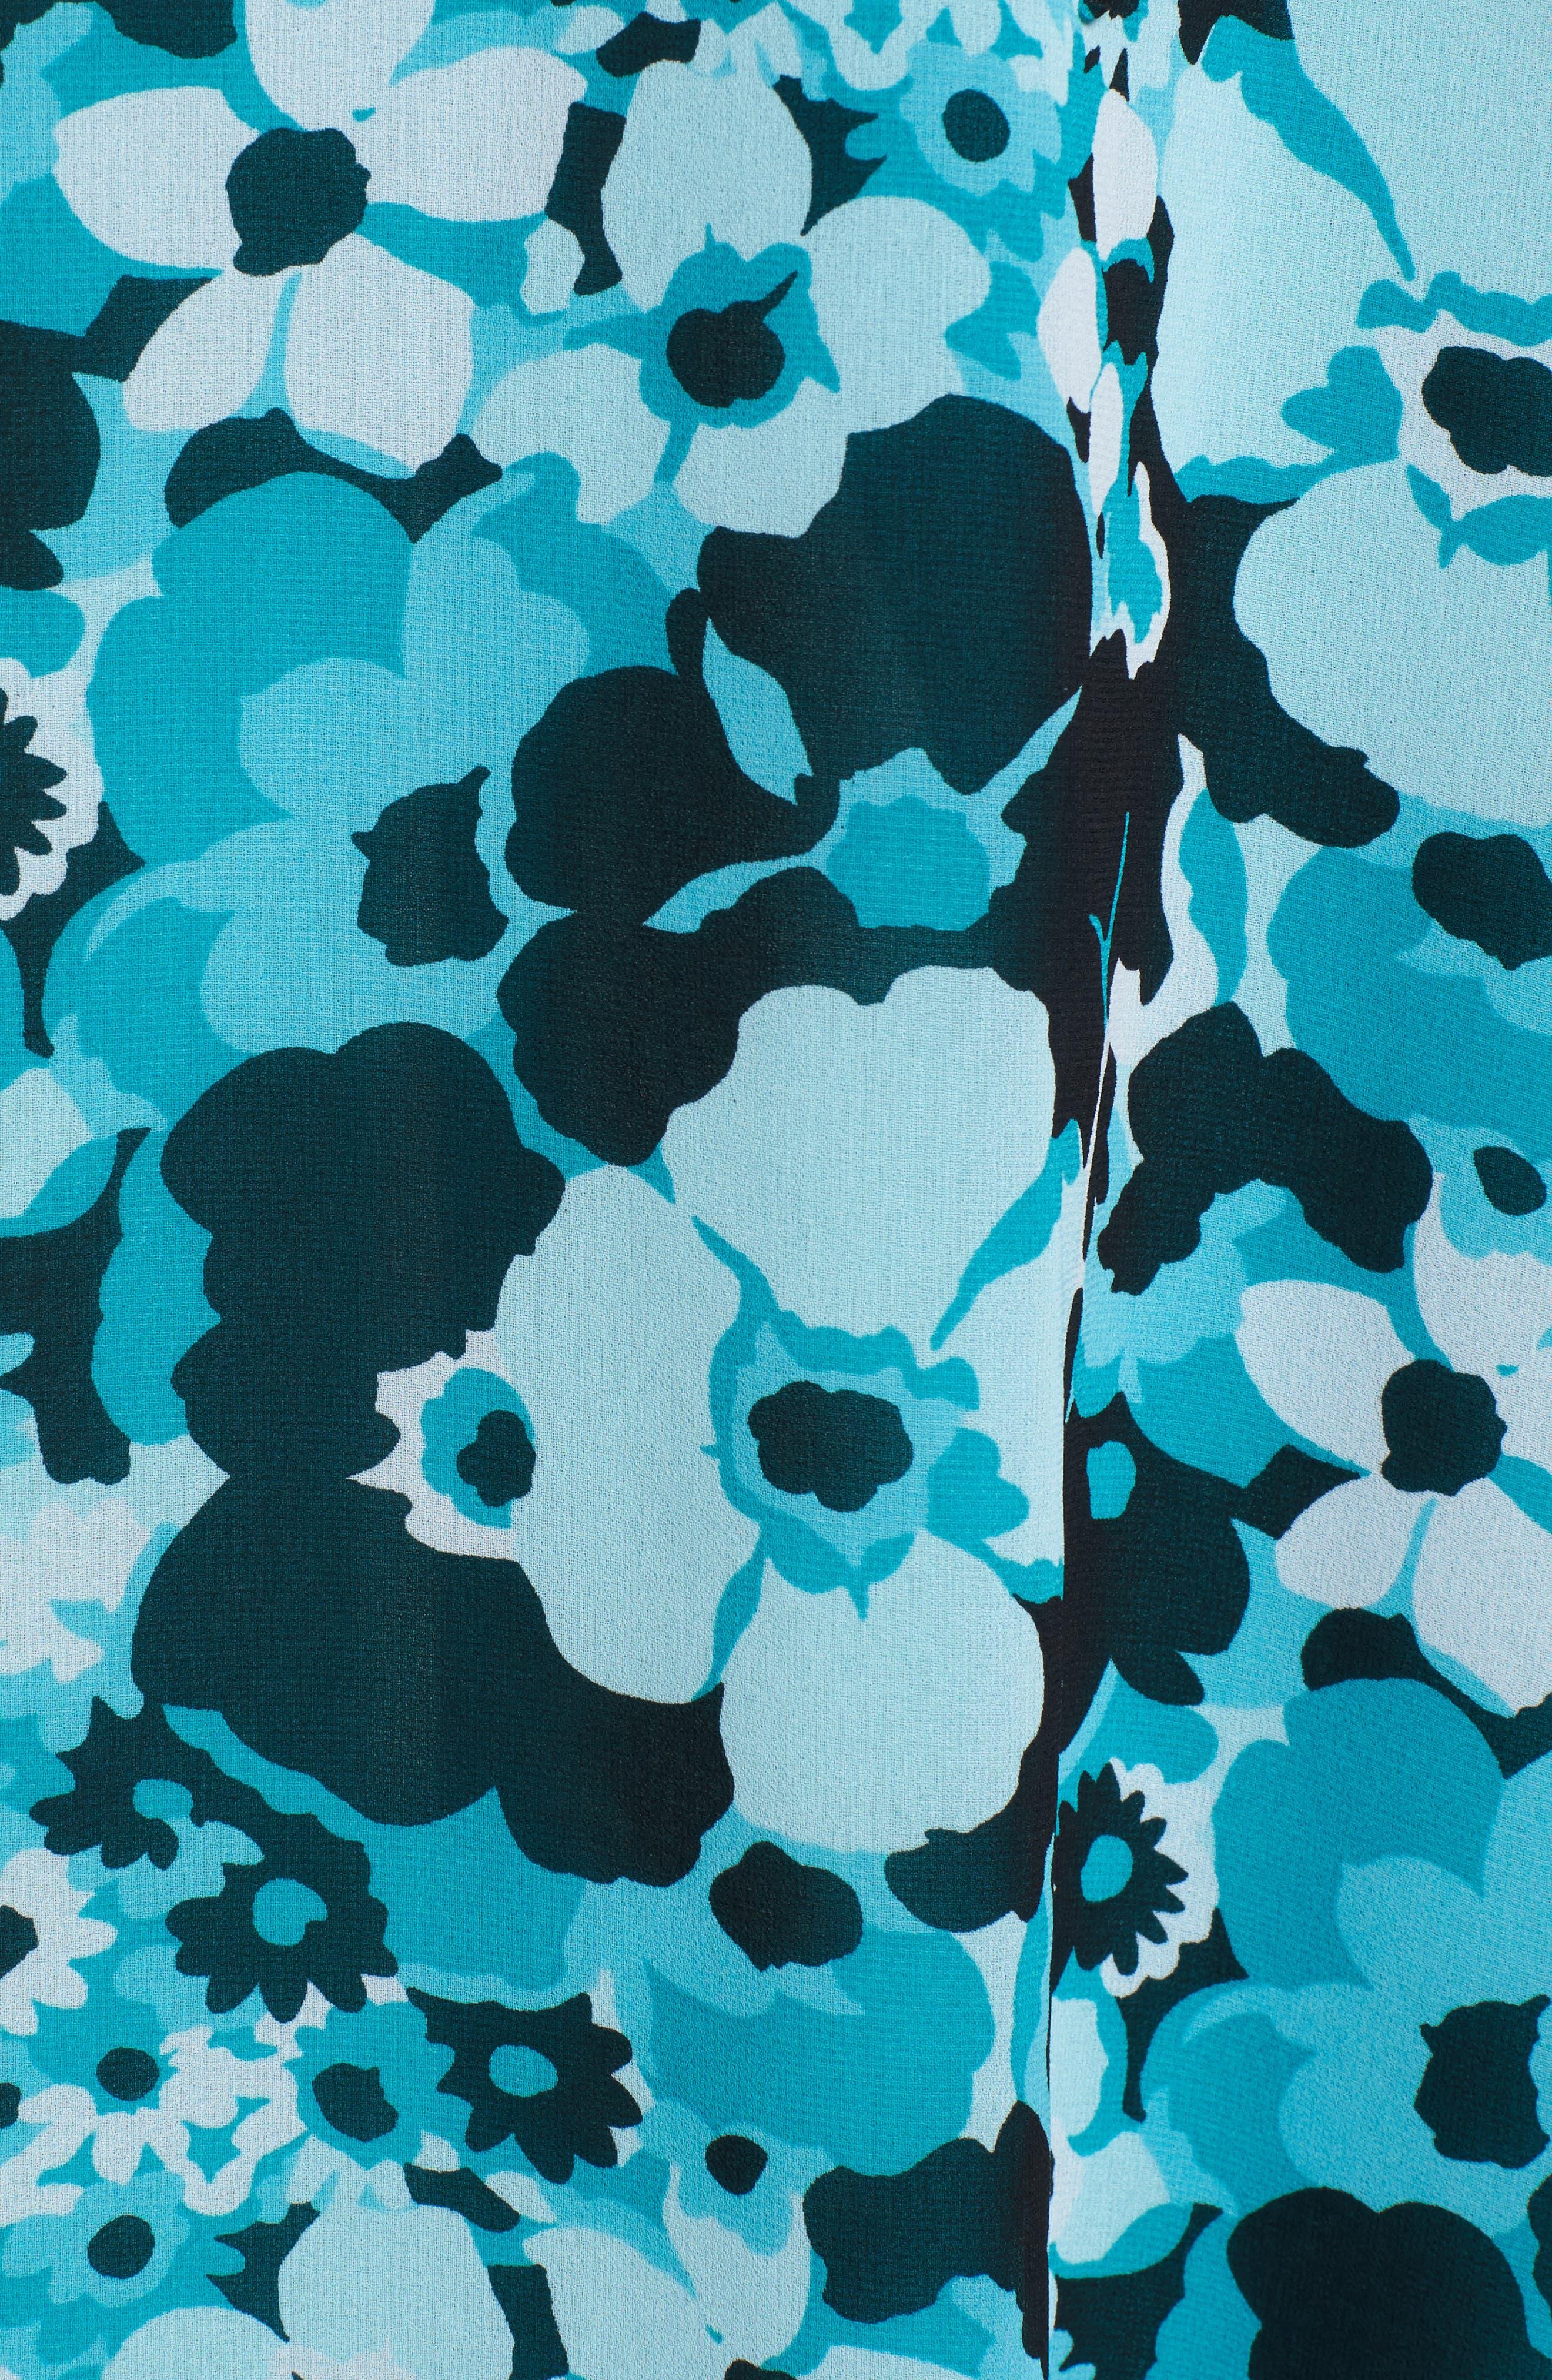 Spring Floral Maxi Dress,                             Alternate thumbnail 5, color,                             494